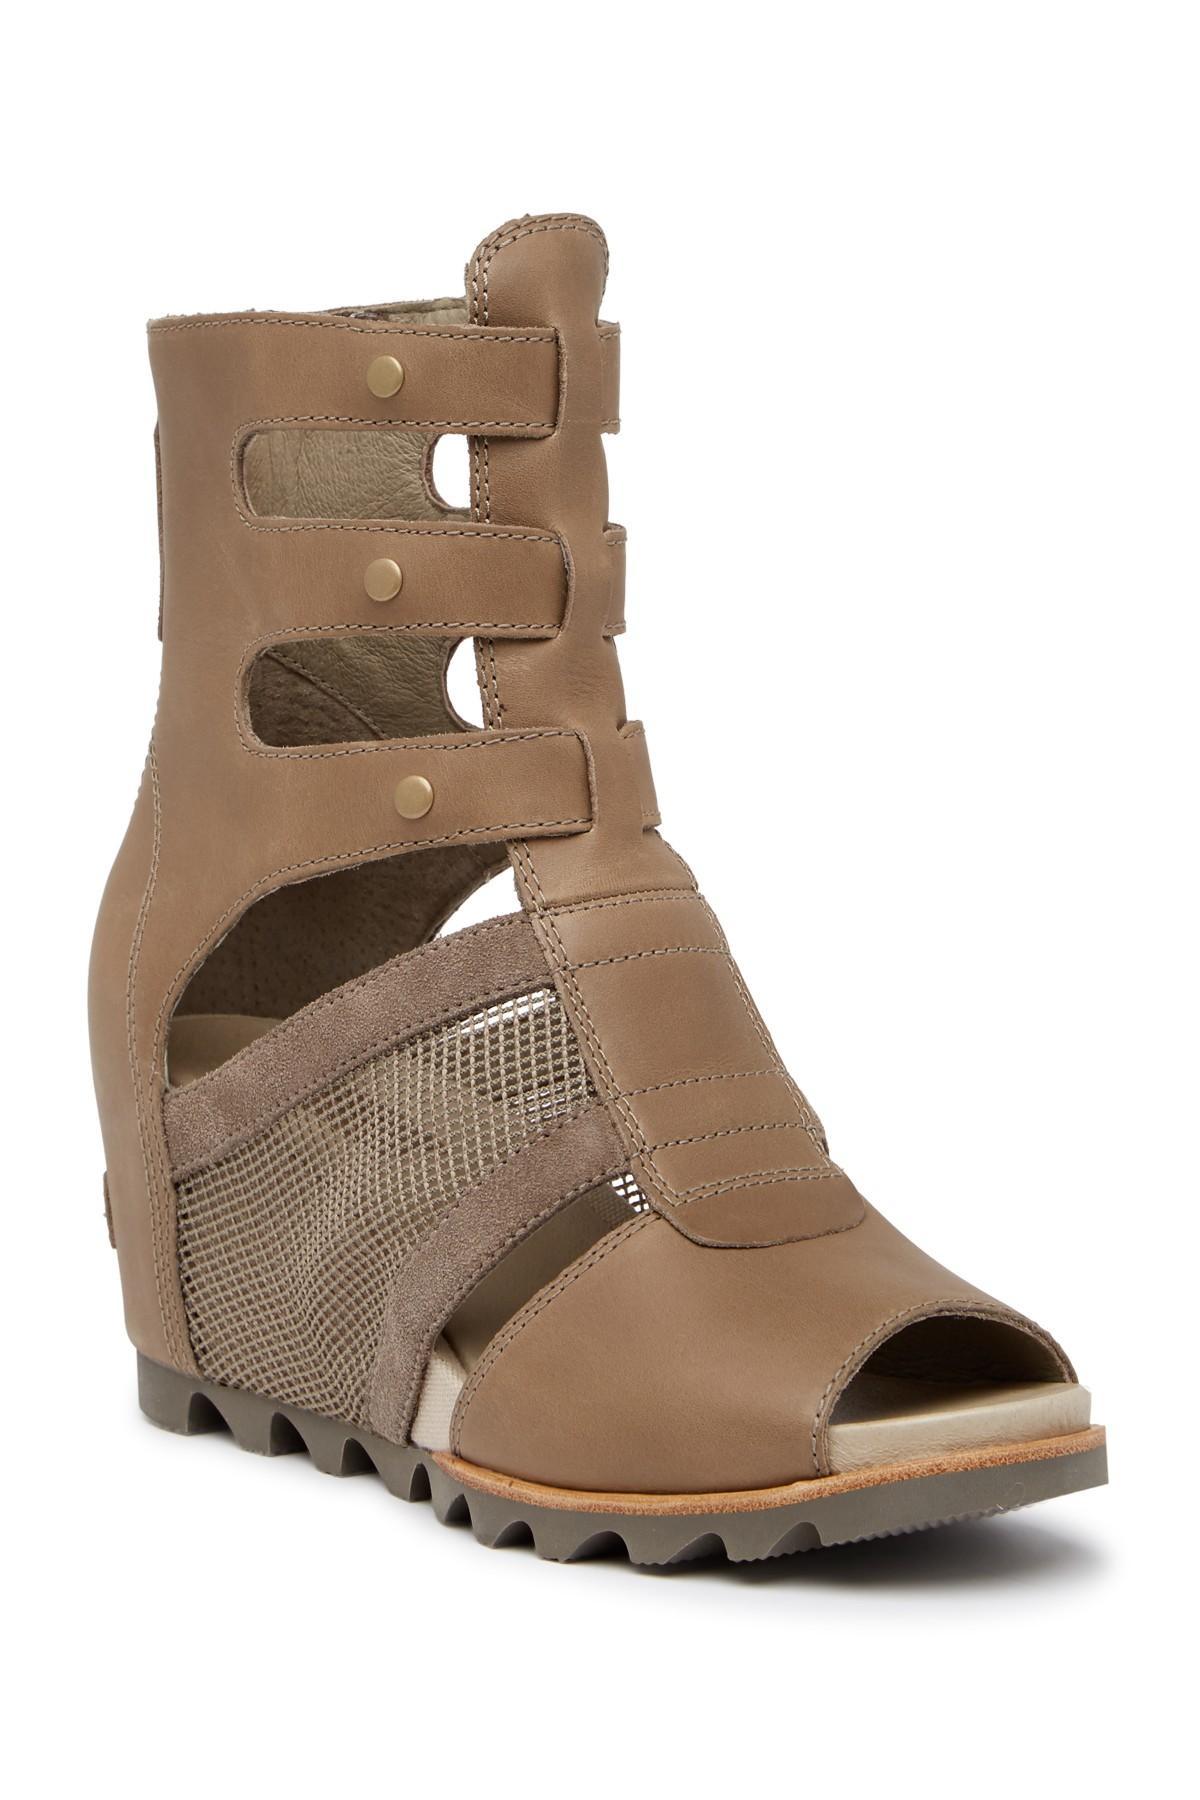 e45668ba0b3c Lyst - Sorel Joanie Gladiator Sandal in Brown